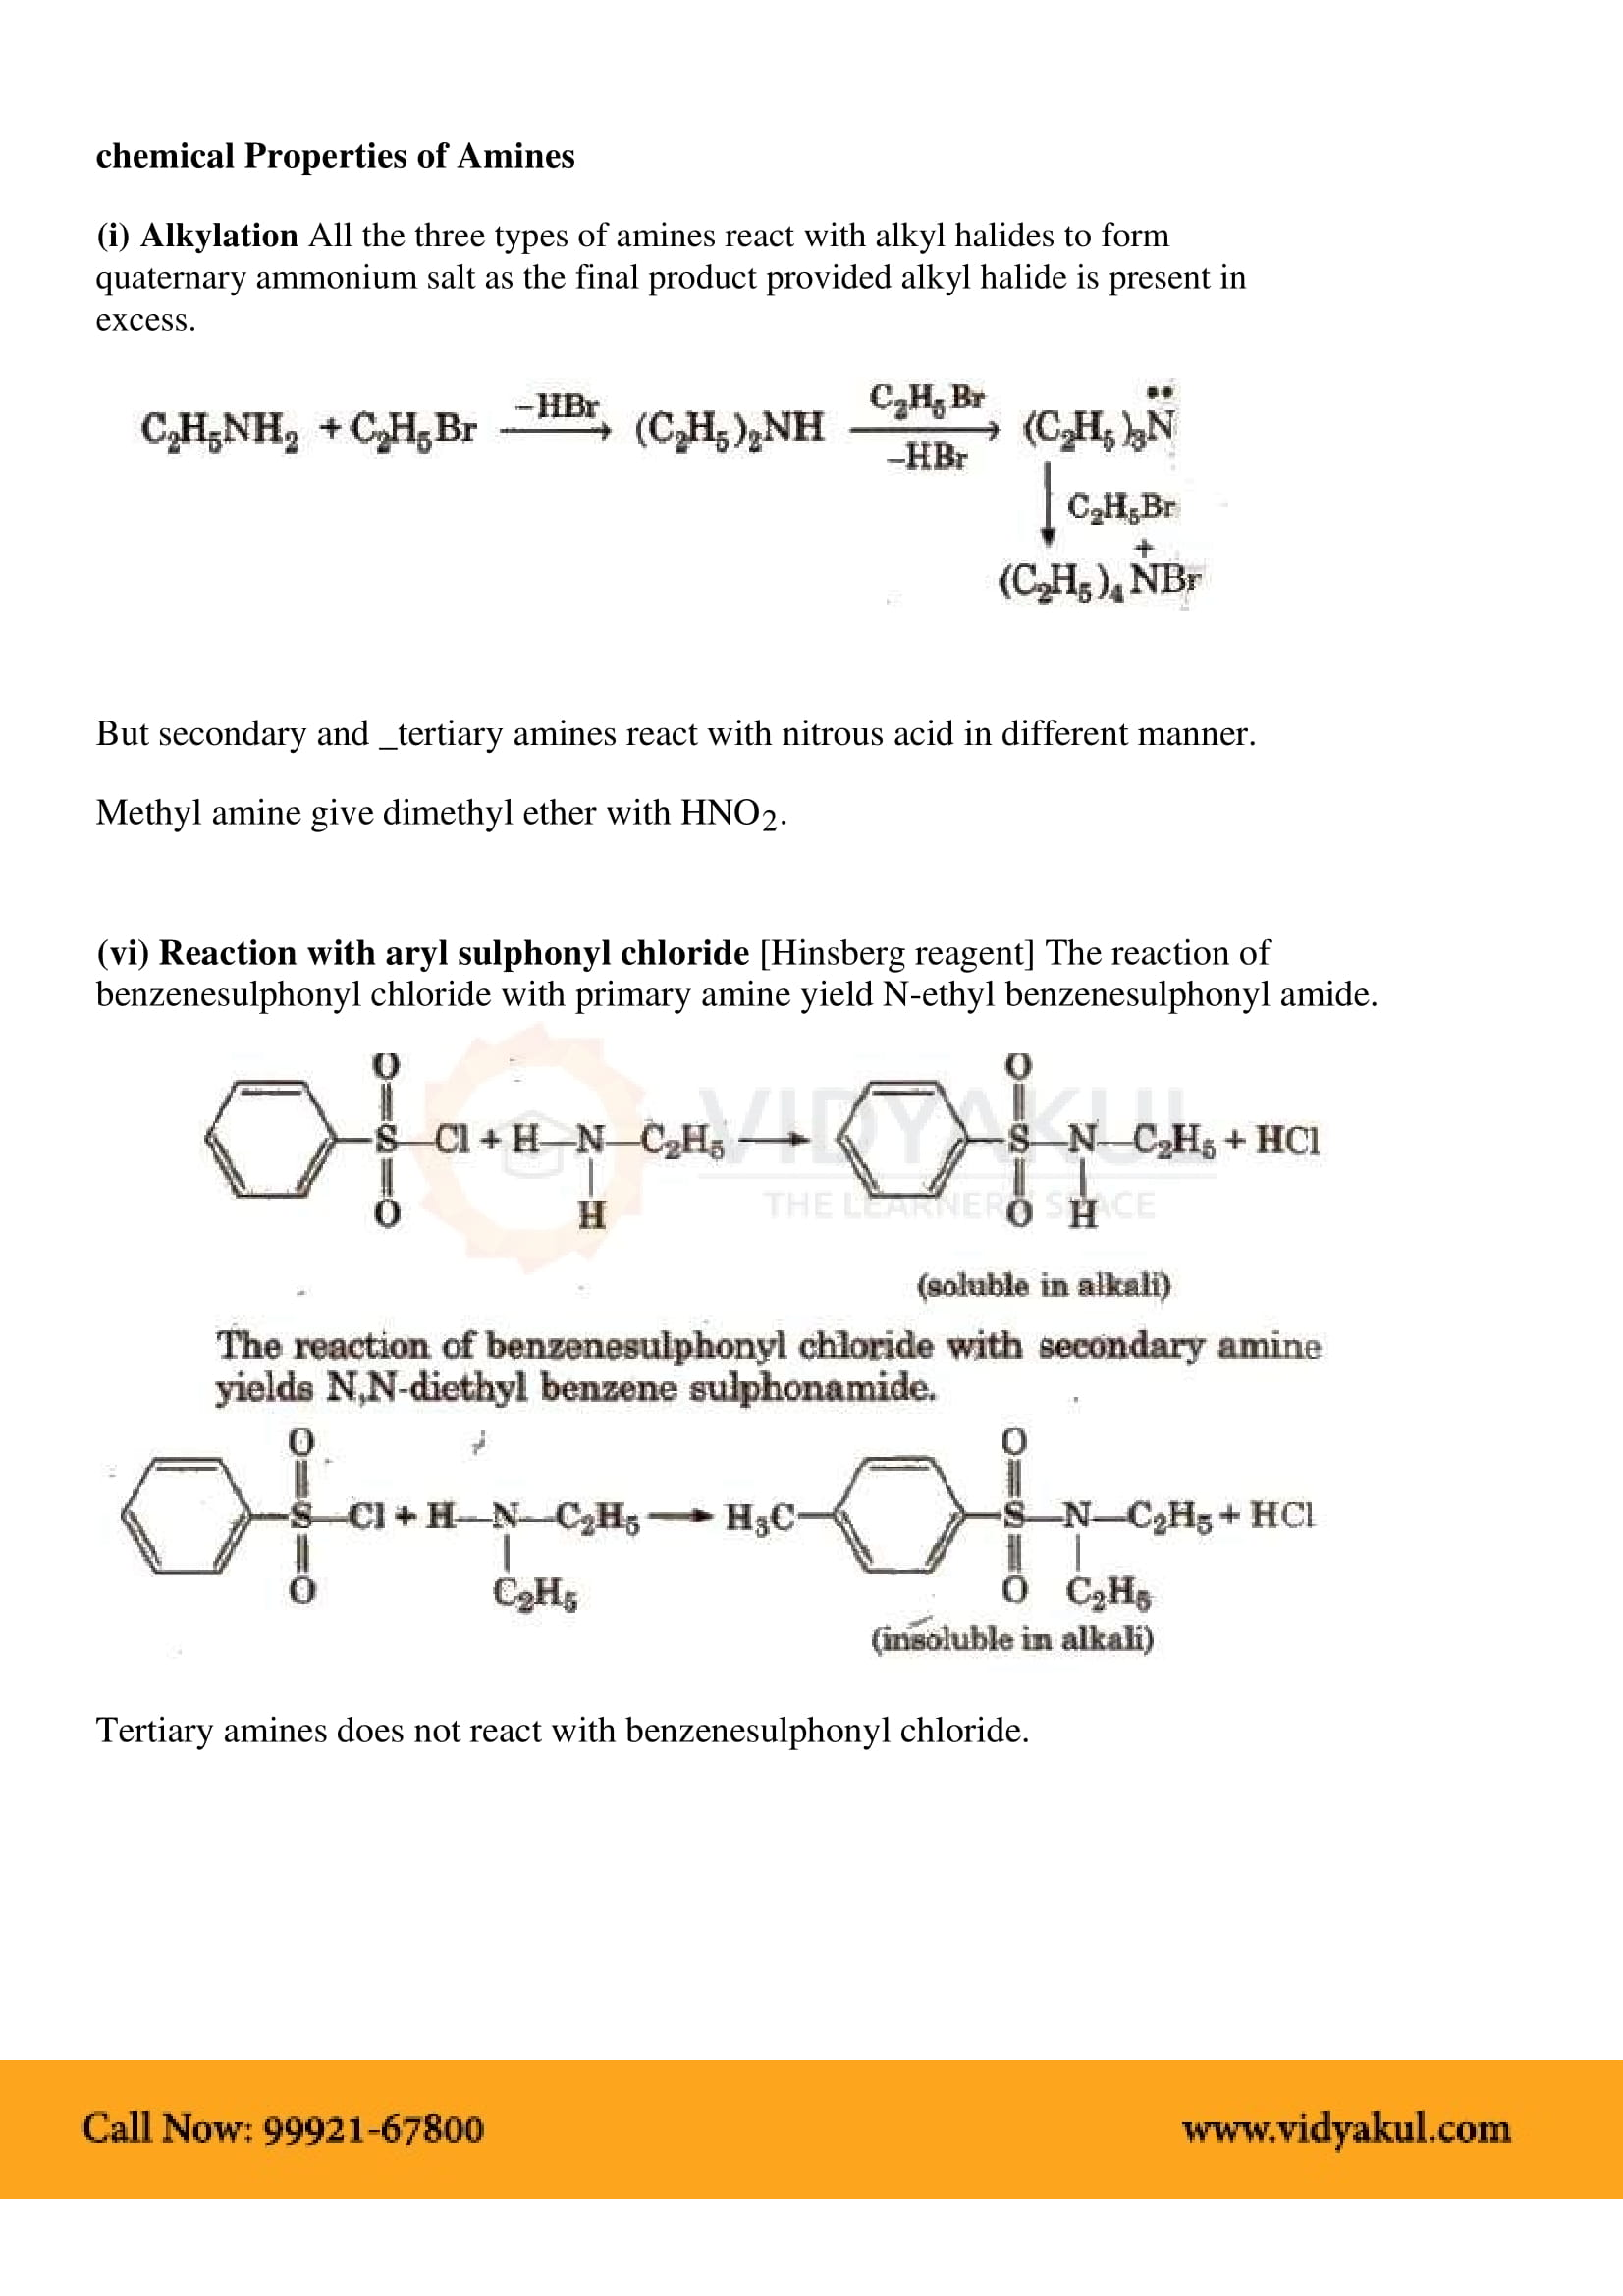 Organic Compounds Containing Nitrogen Class 12 Notes   Vidyakul